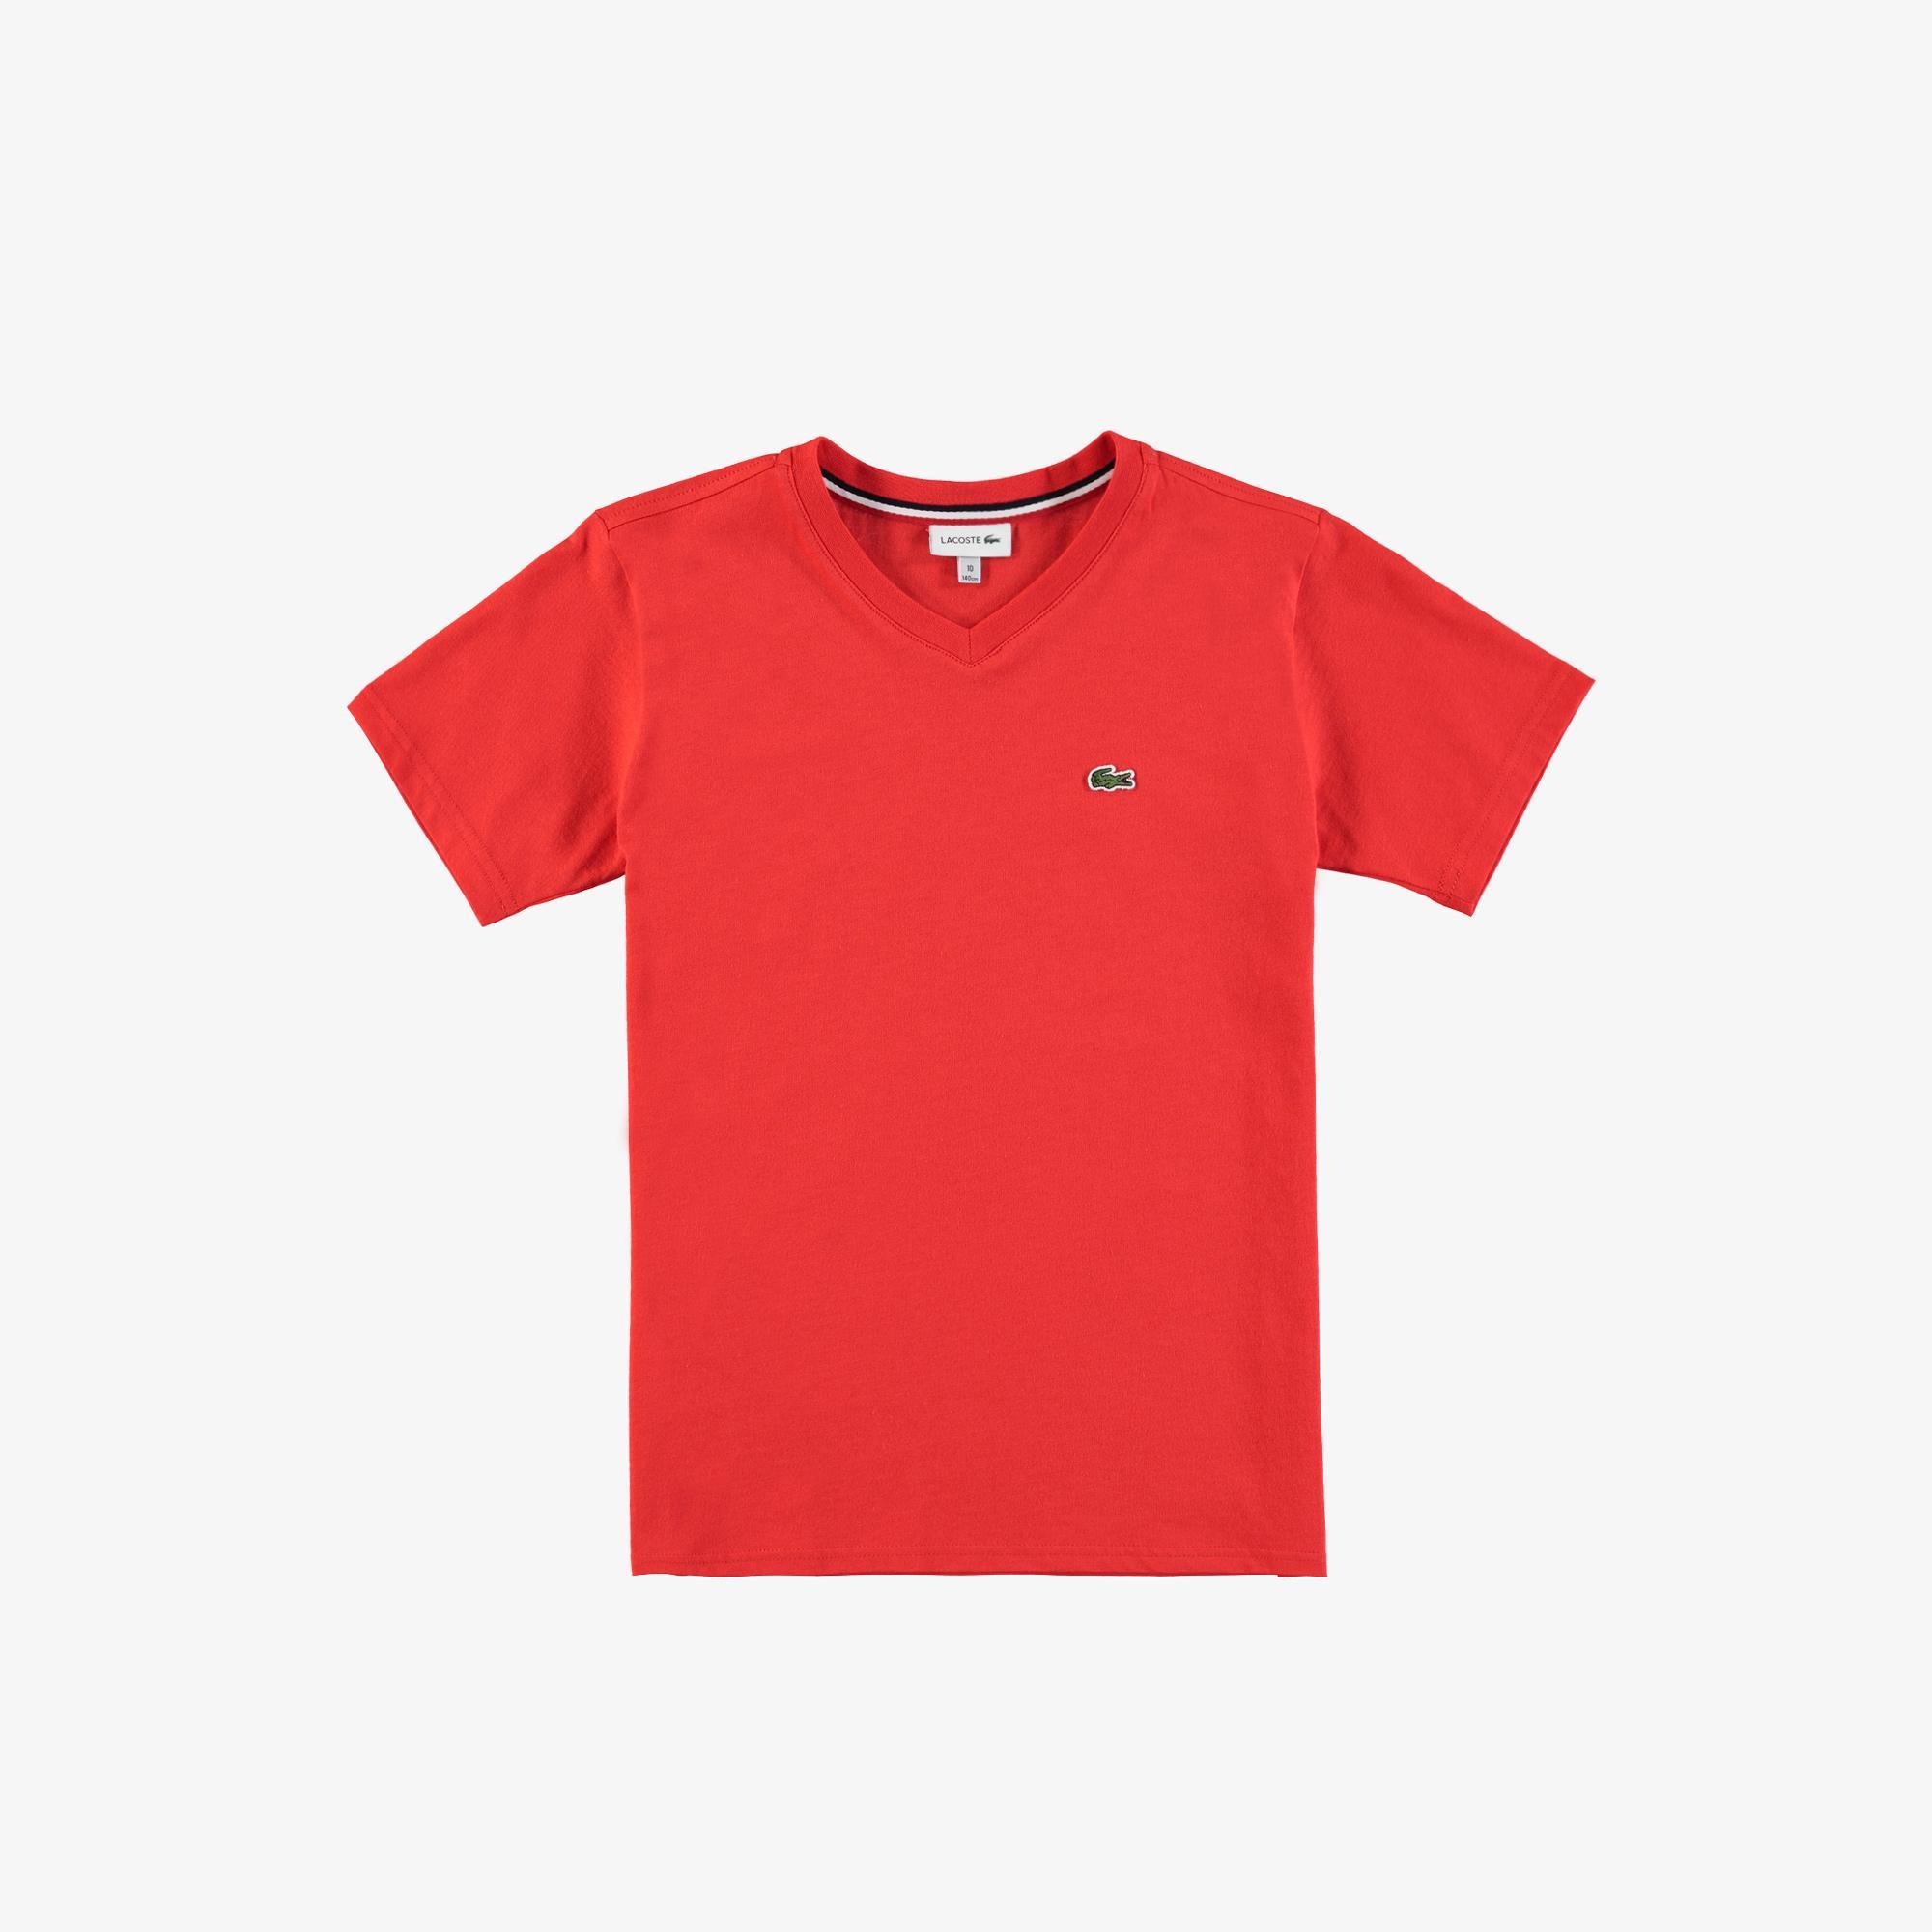 Lacoste Çocuk V Yaka Kırmızı T-Shirt